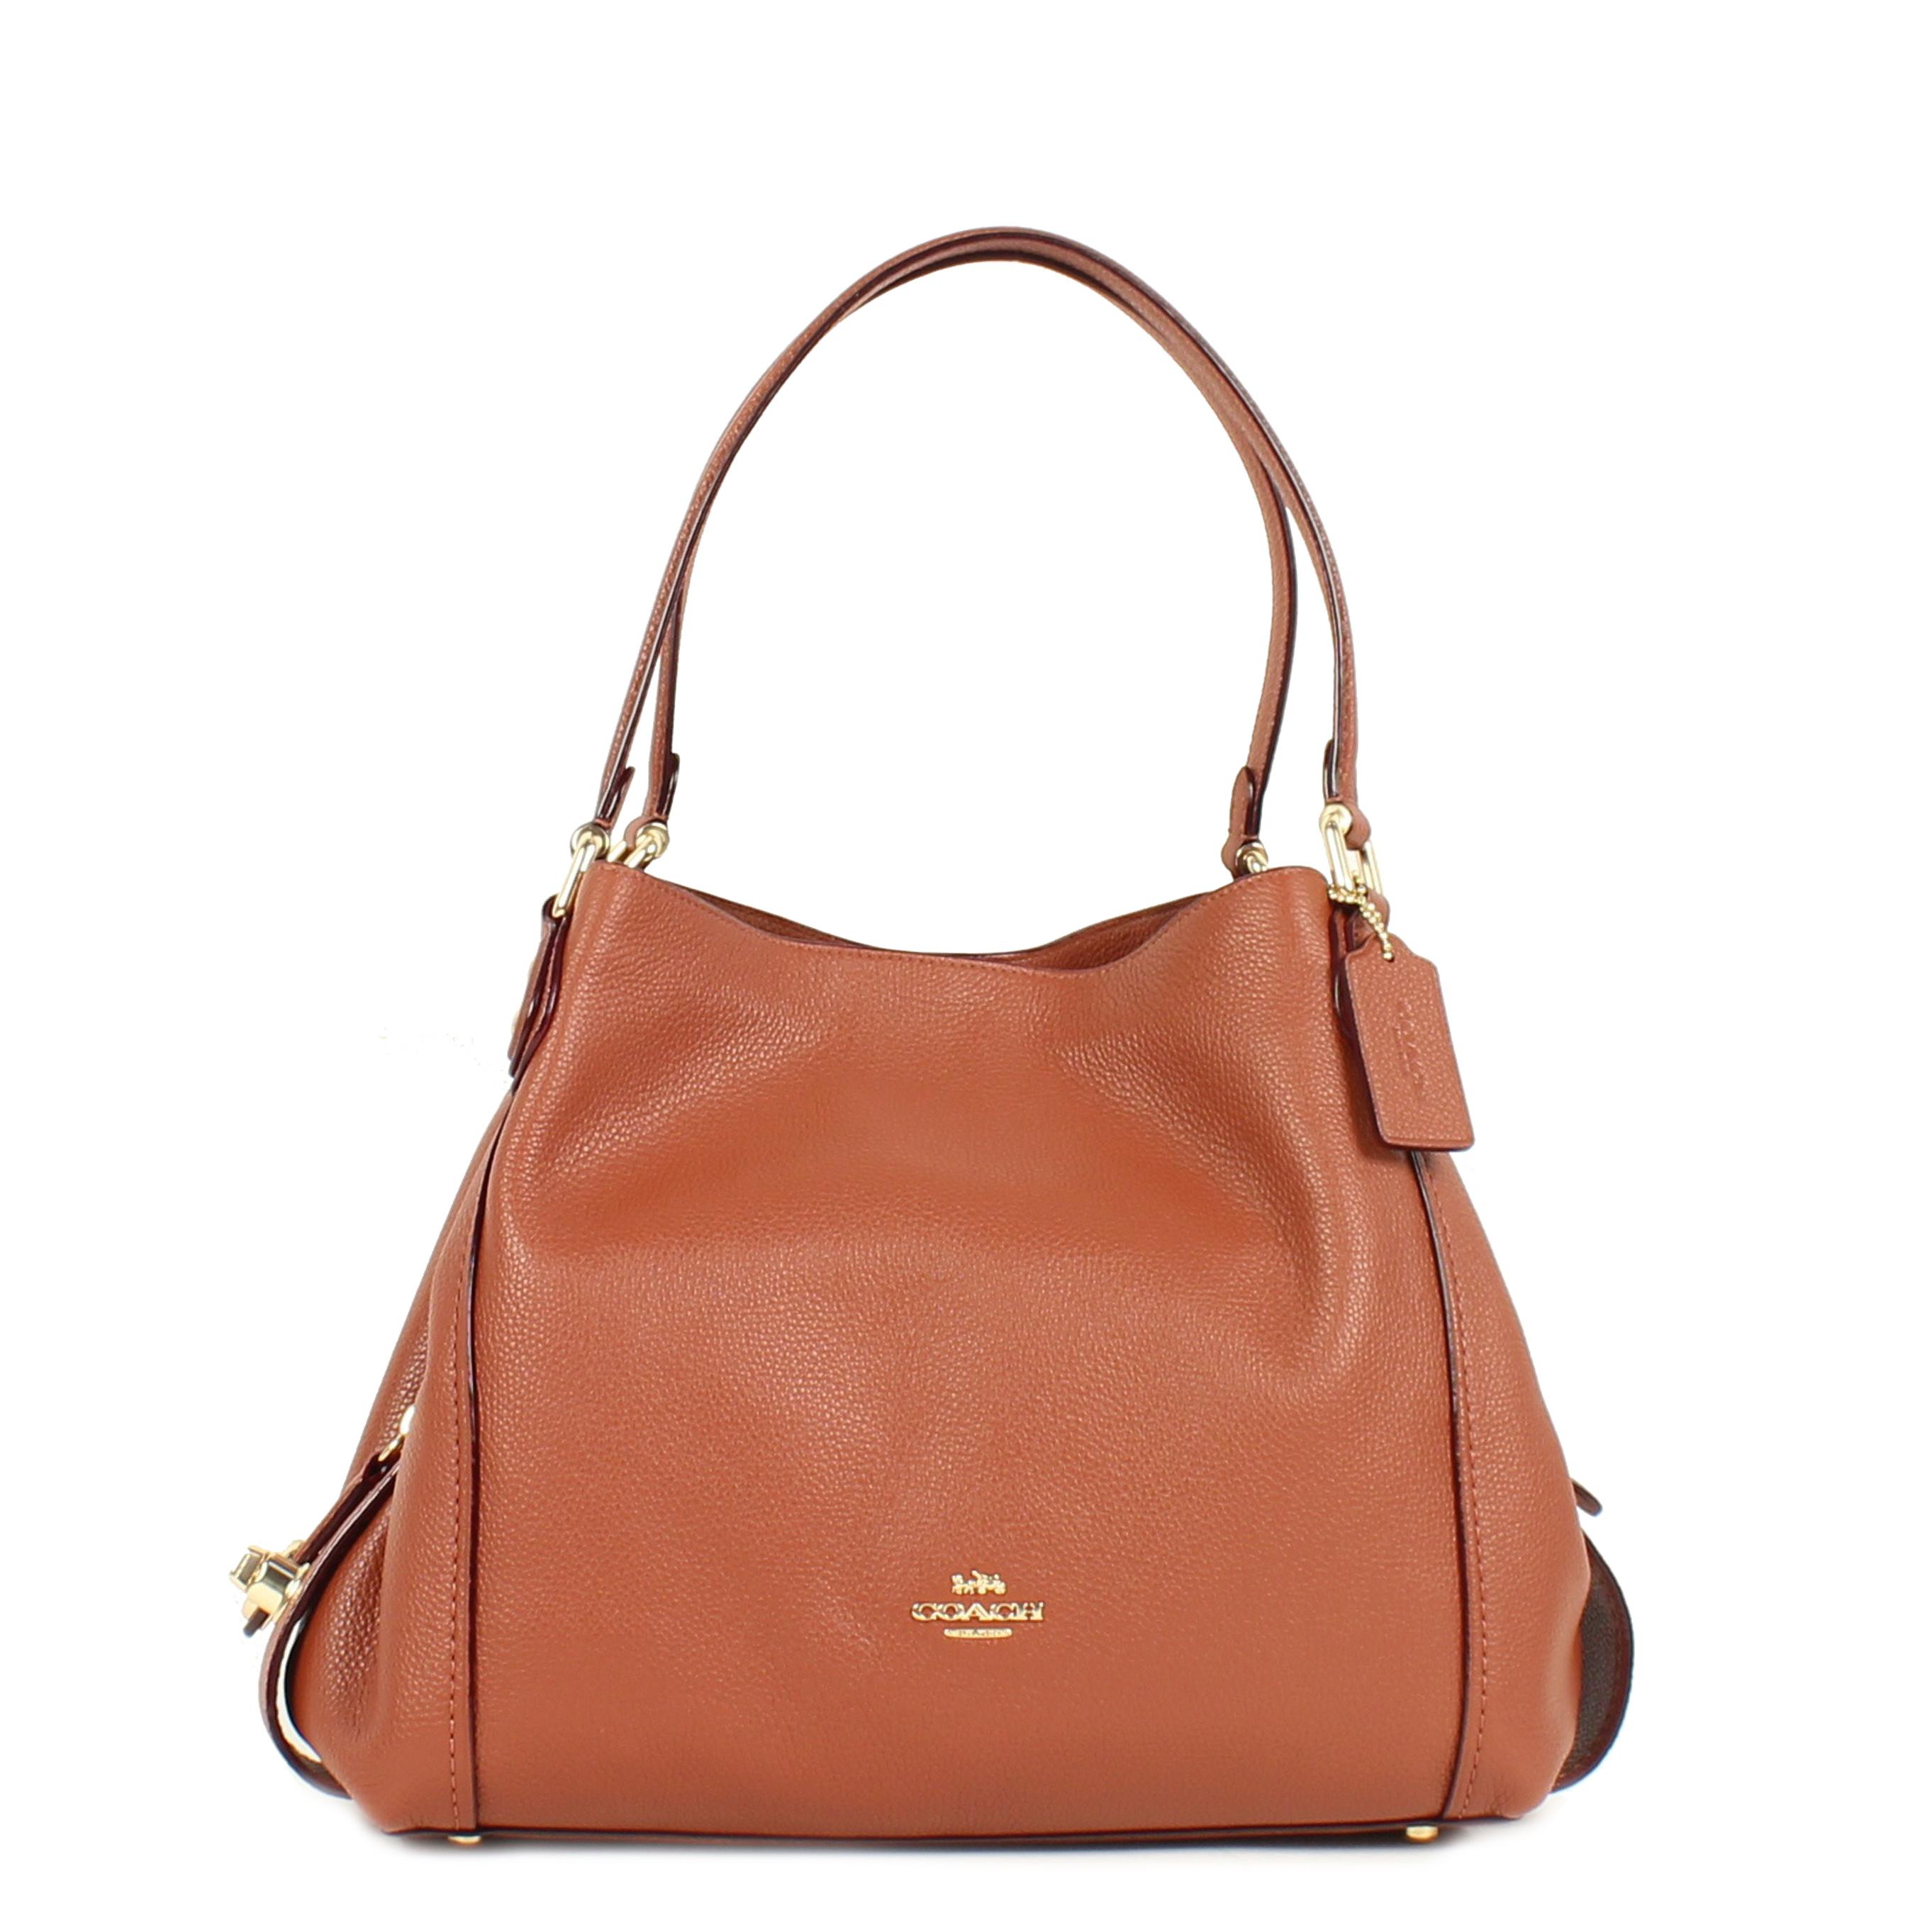 315131dba2f Tassen online kopen | Fashionchick.nl | De tassen trends